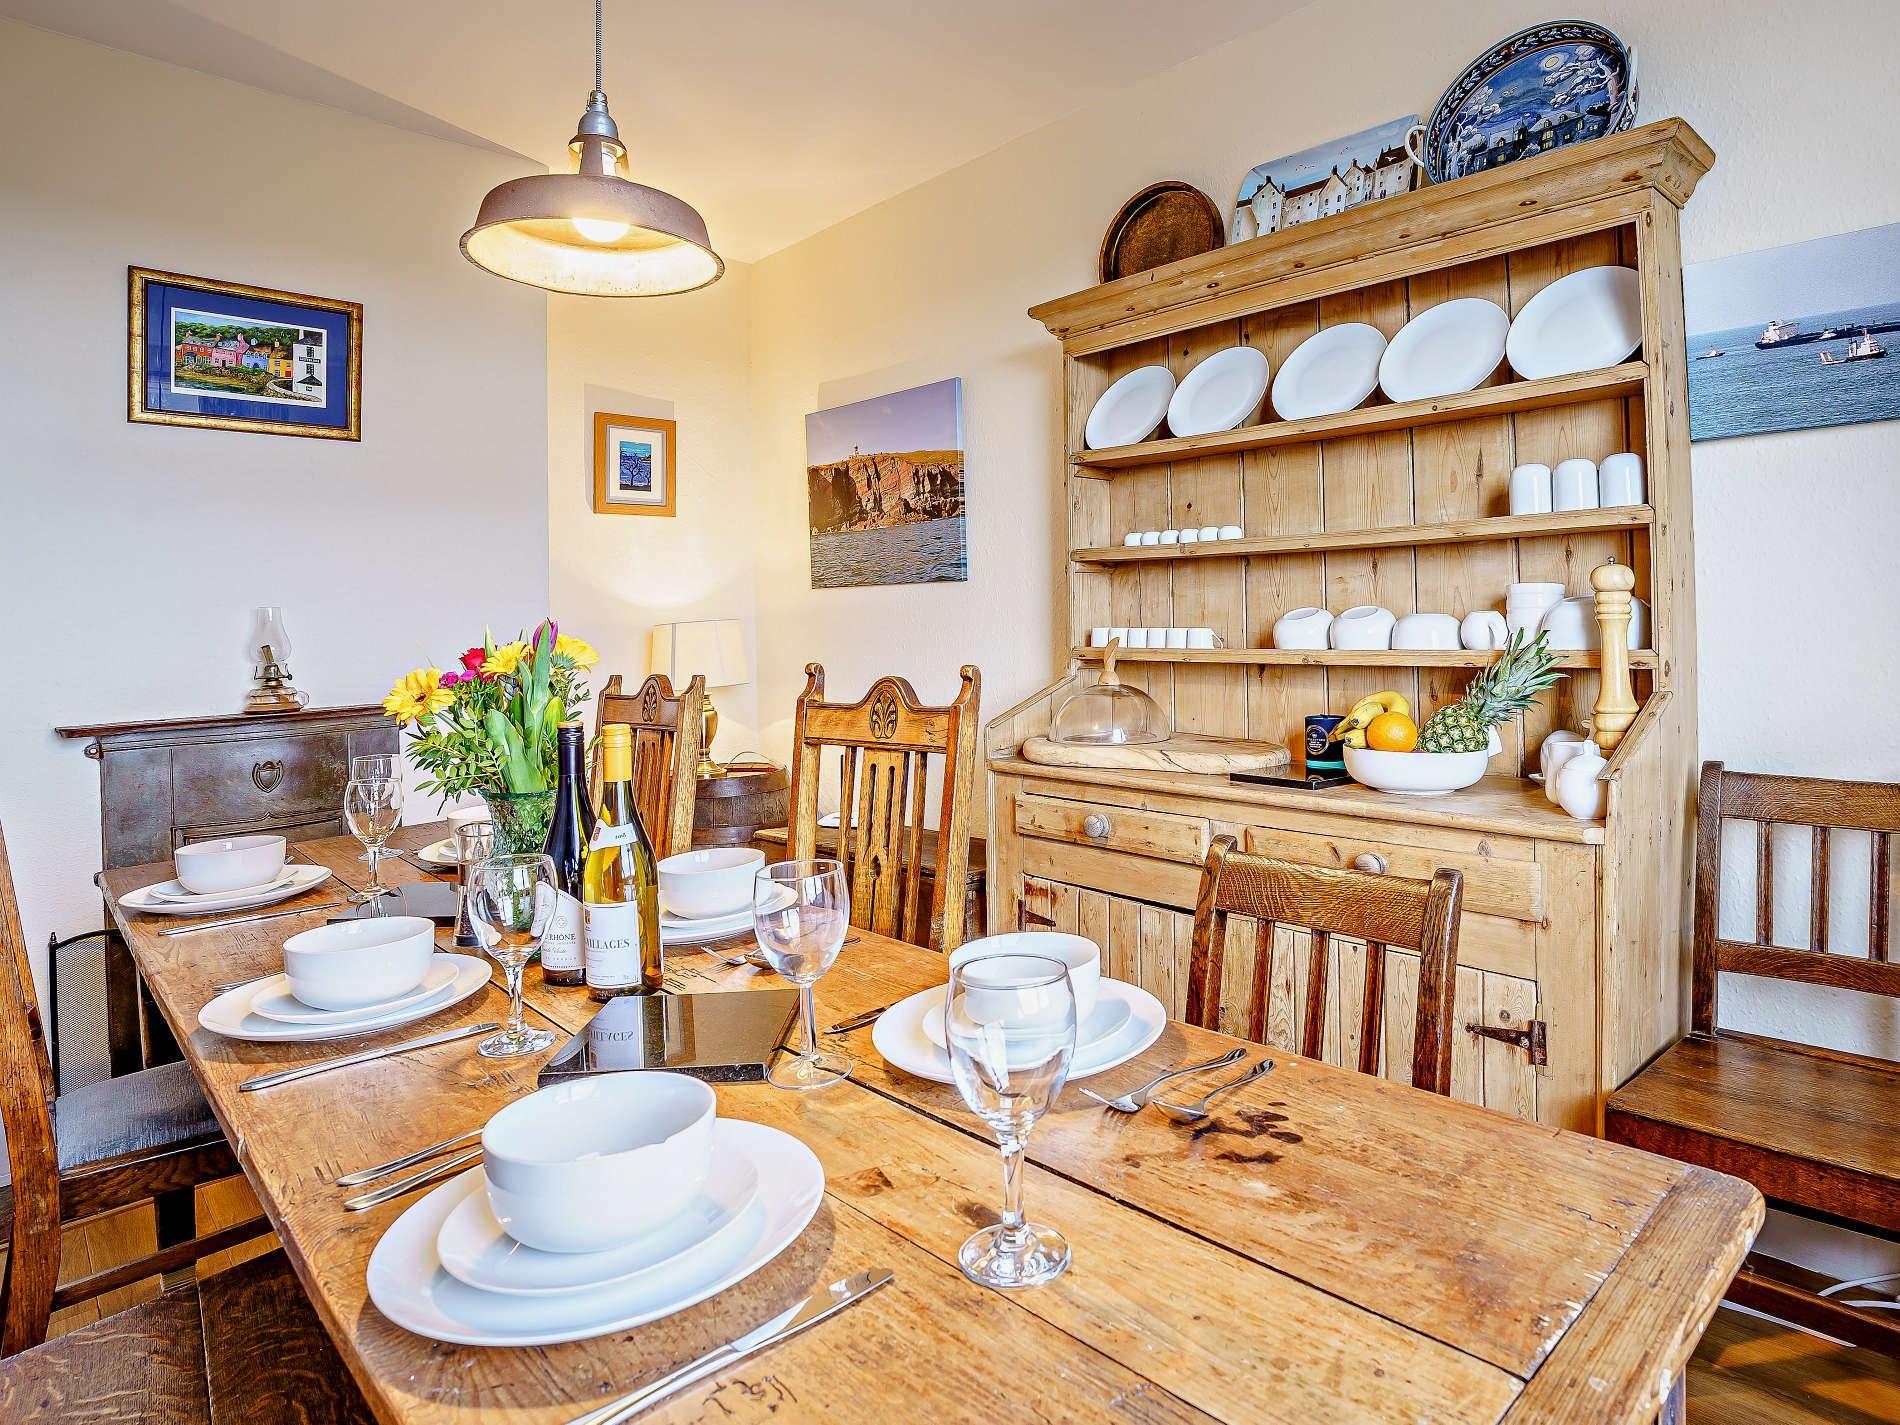 3 Bedroom Cottage in Haverfordwest, Mid Wales